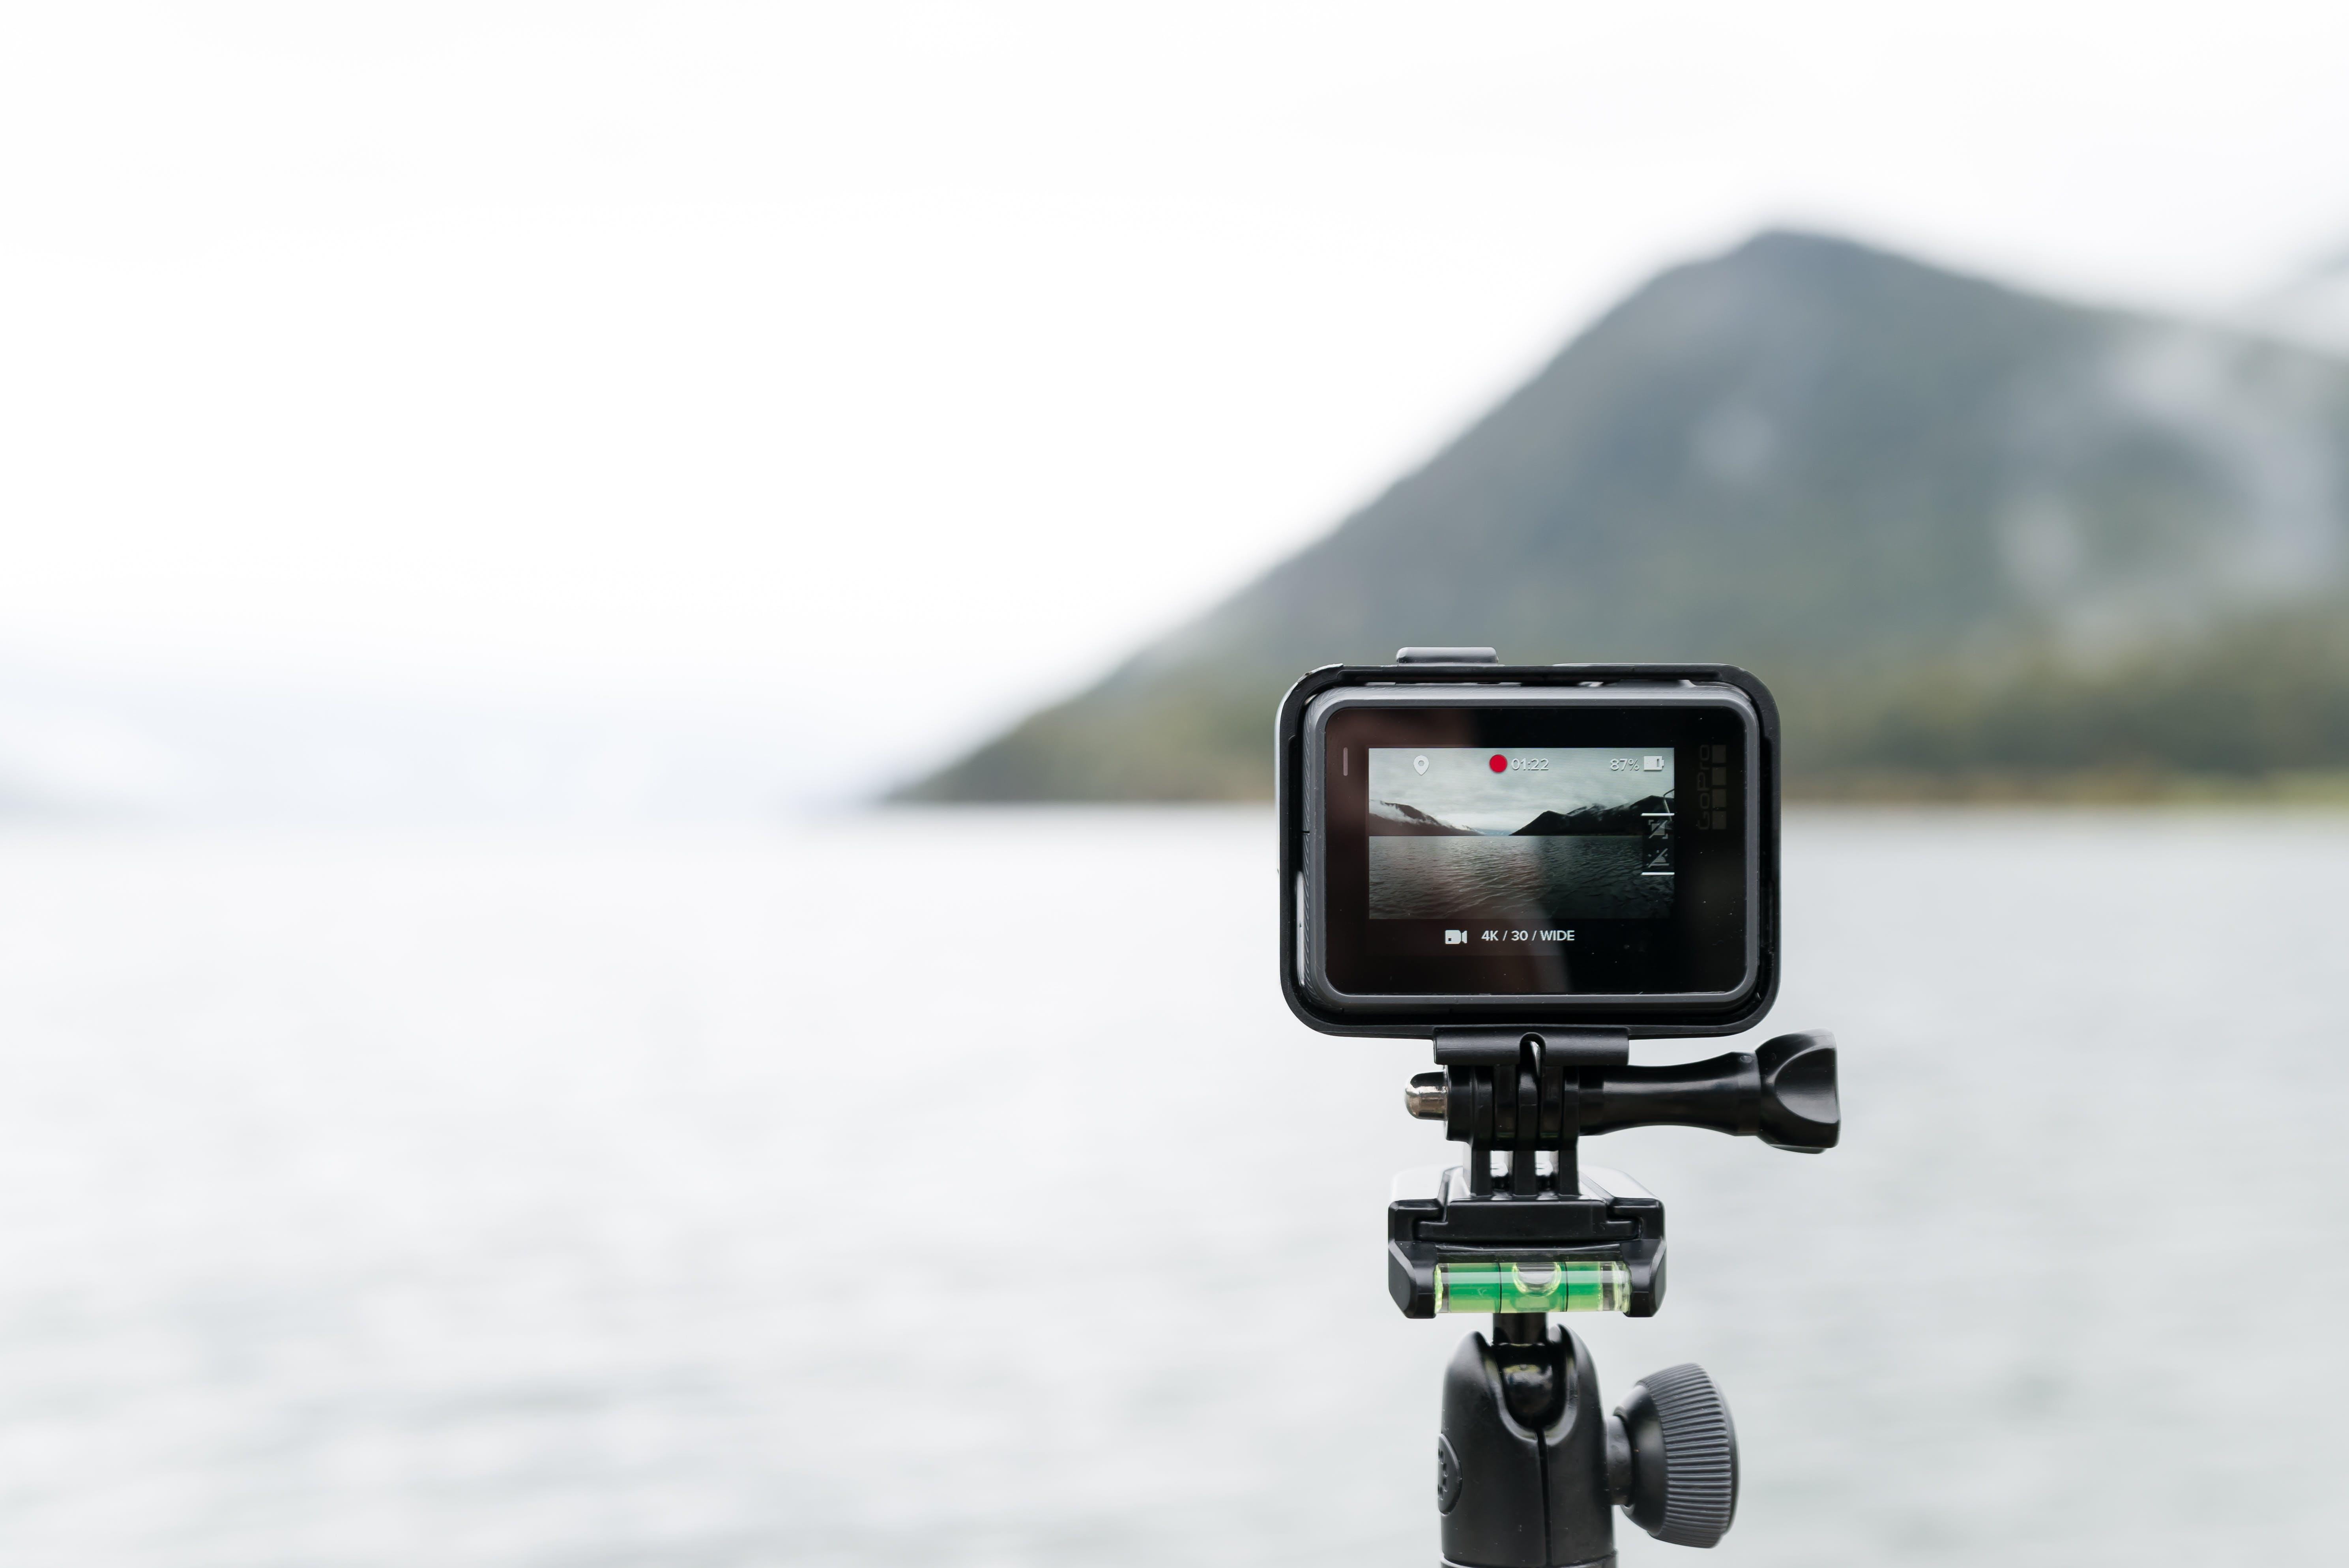 Безкоштовне стокове фото на тему «GoPro, відео, запис, камера»